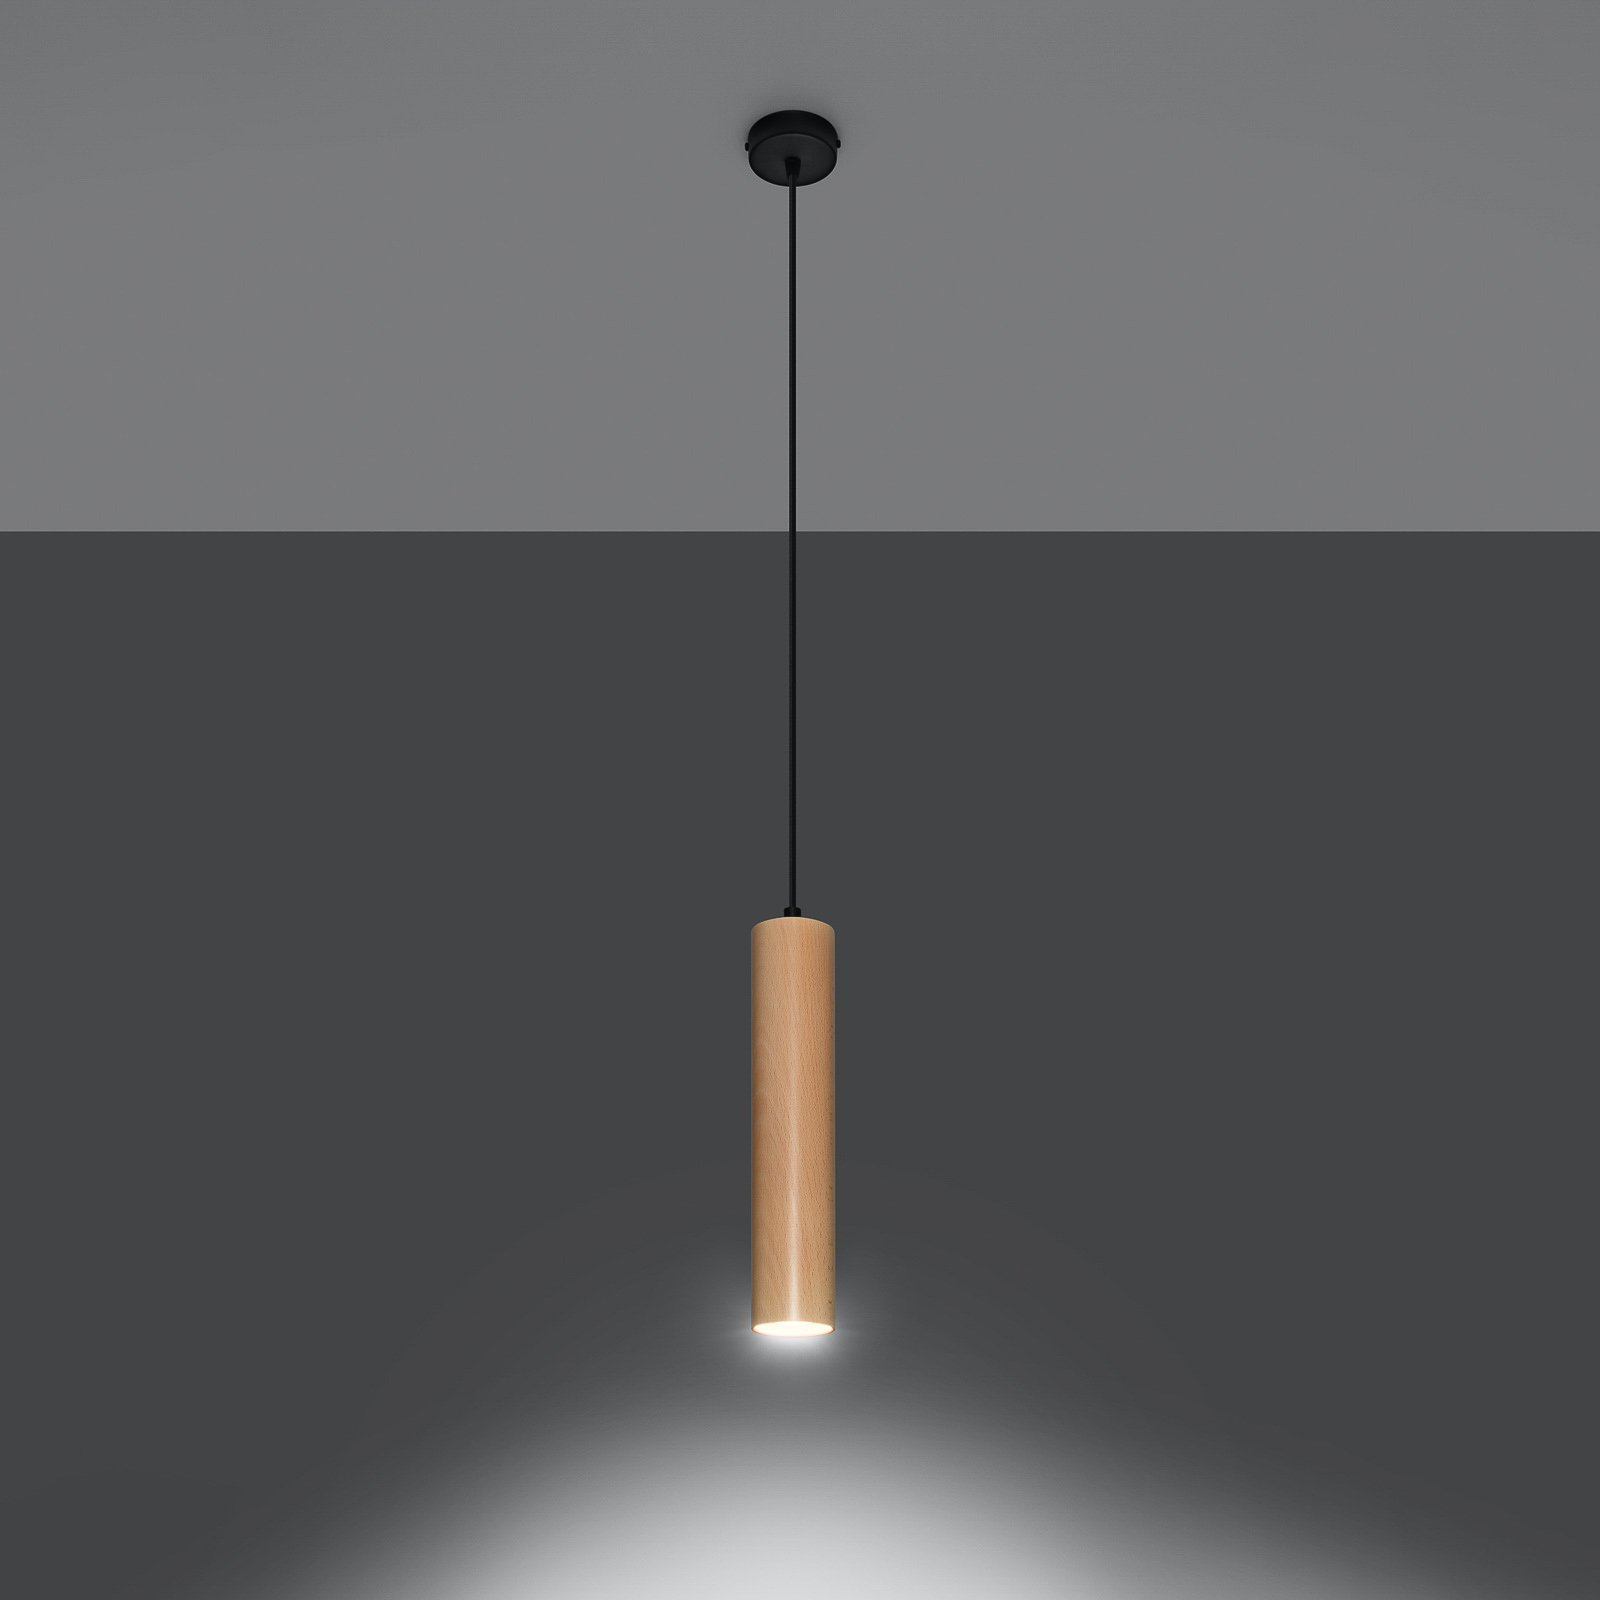 Hanglamp Tube van hout, 1-lamp